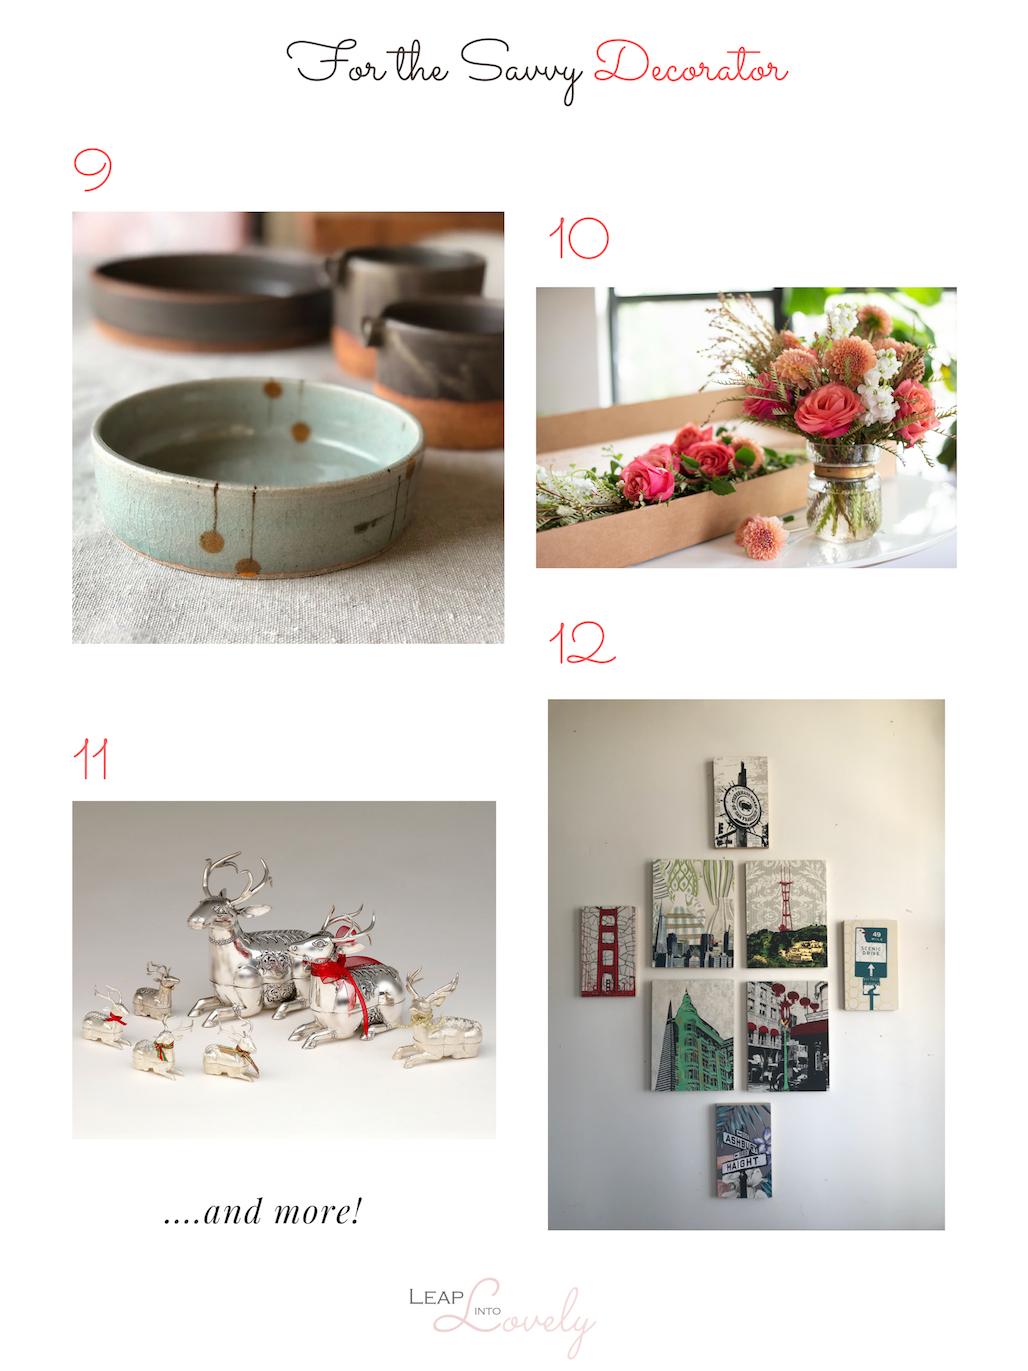 9.  Tomoko Ceramics  || 10.  Matilda's Bloombox  || 11.  Kasumisou Gallery  || 12.  Jennifer Clifford Art + Design